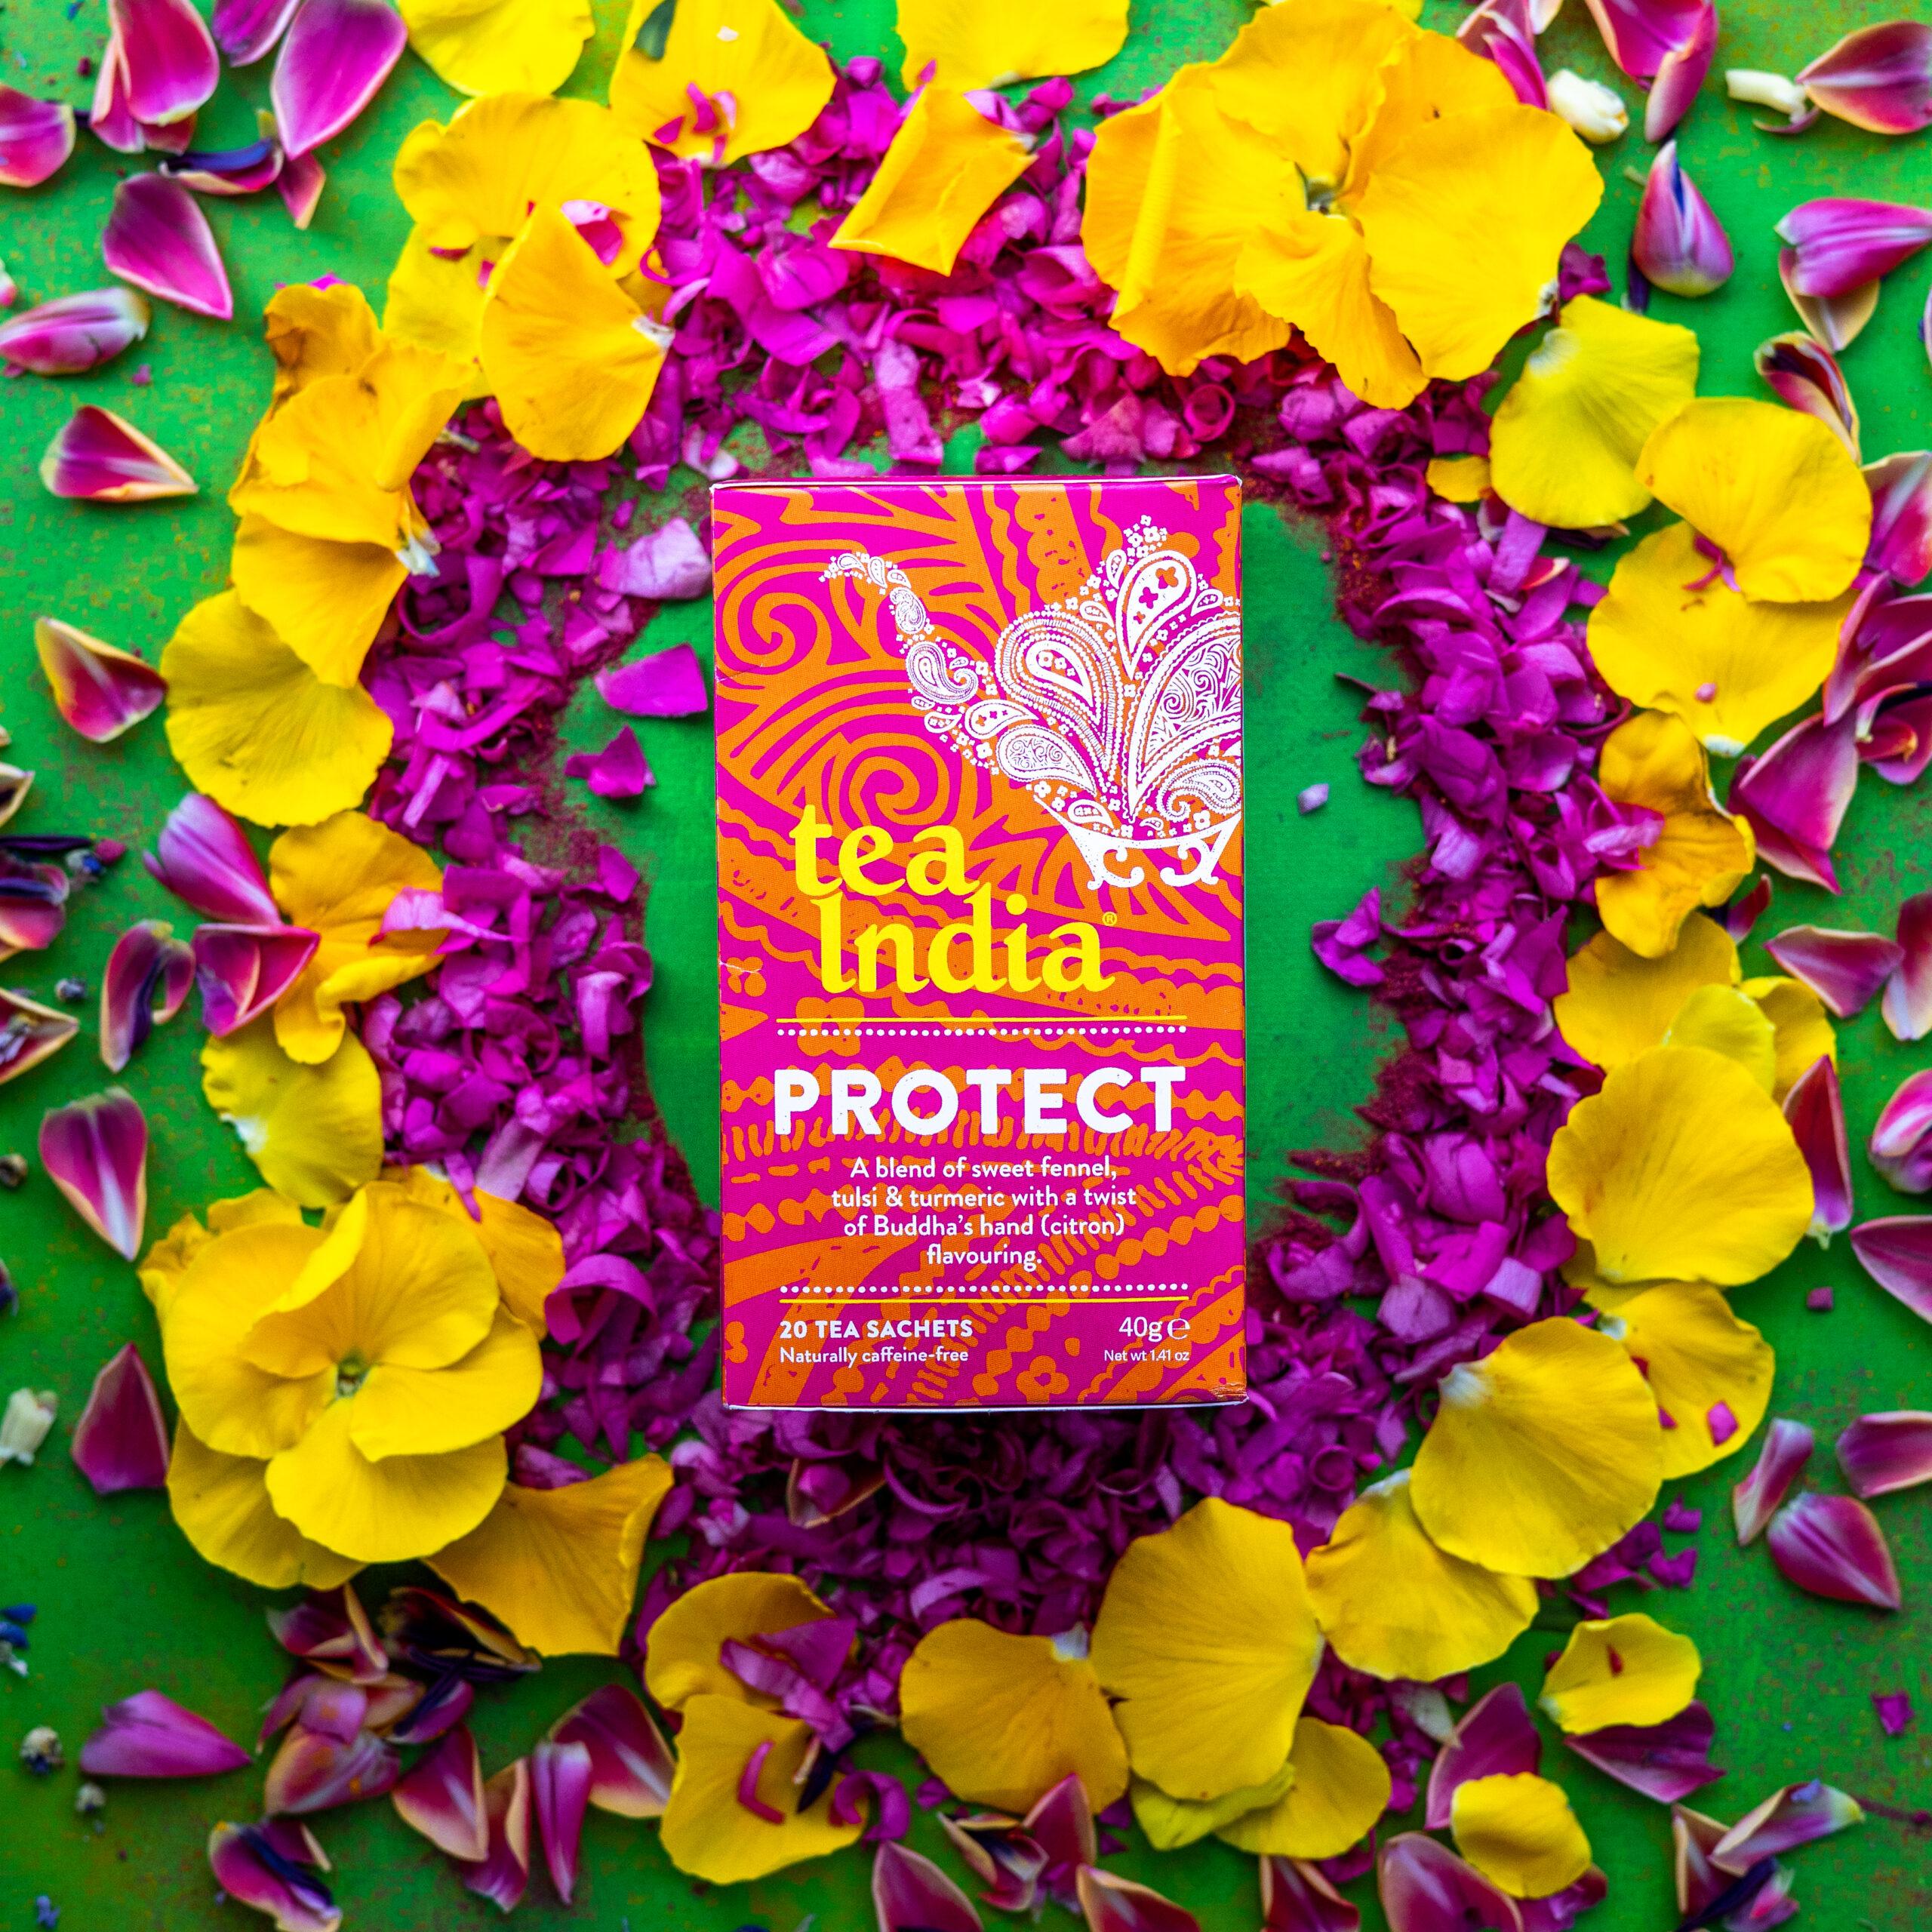 Tea India Herbal Tea for Protect